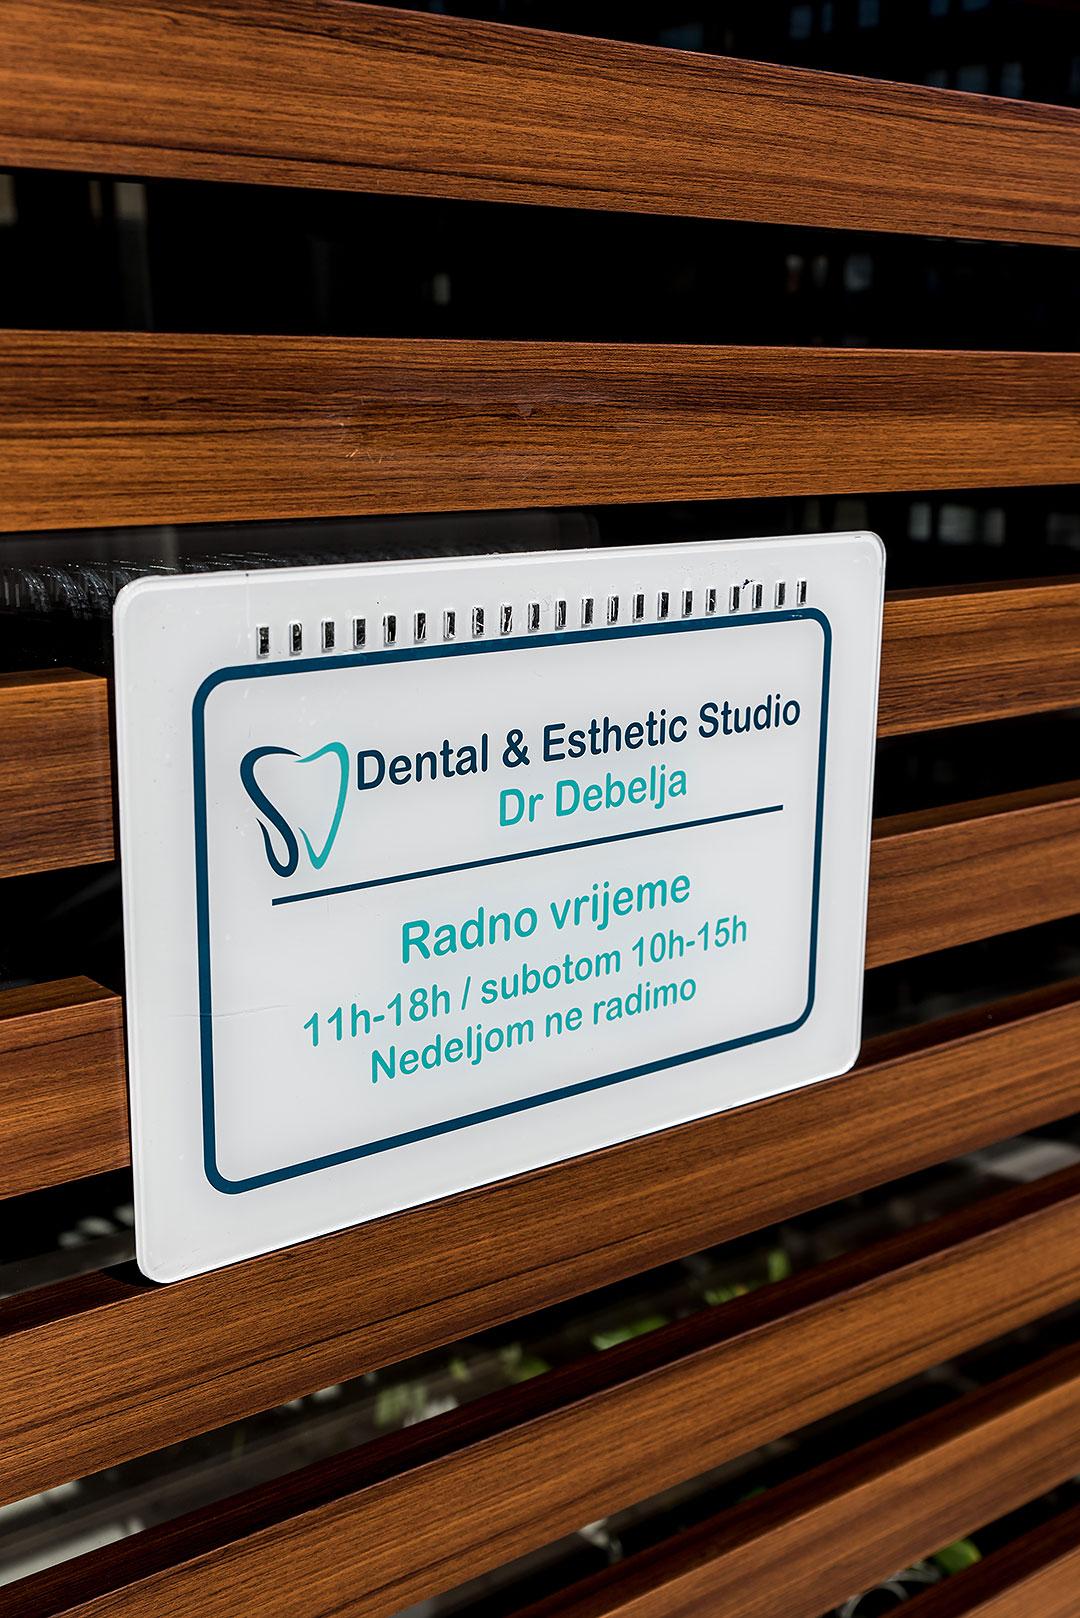 Dental Office Label | Dental Esthetic Studio Dr Debelja Bar Tivari Montenegro